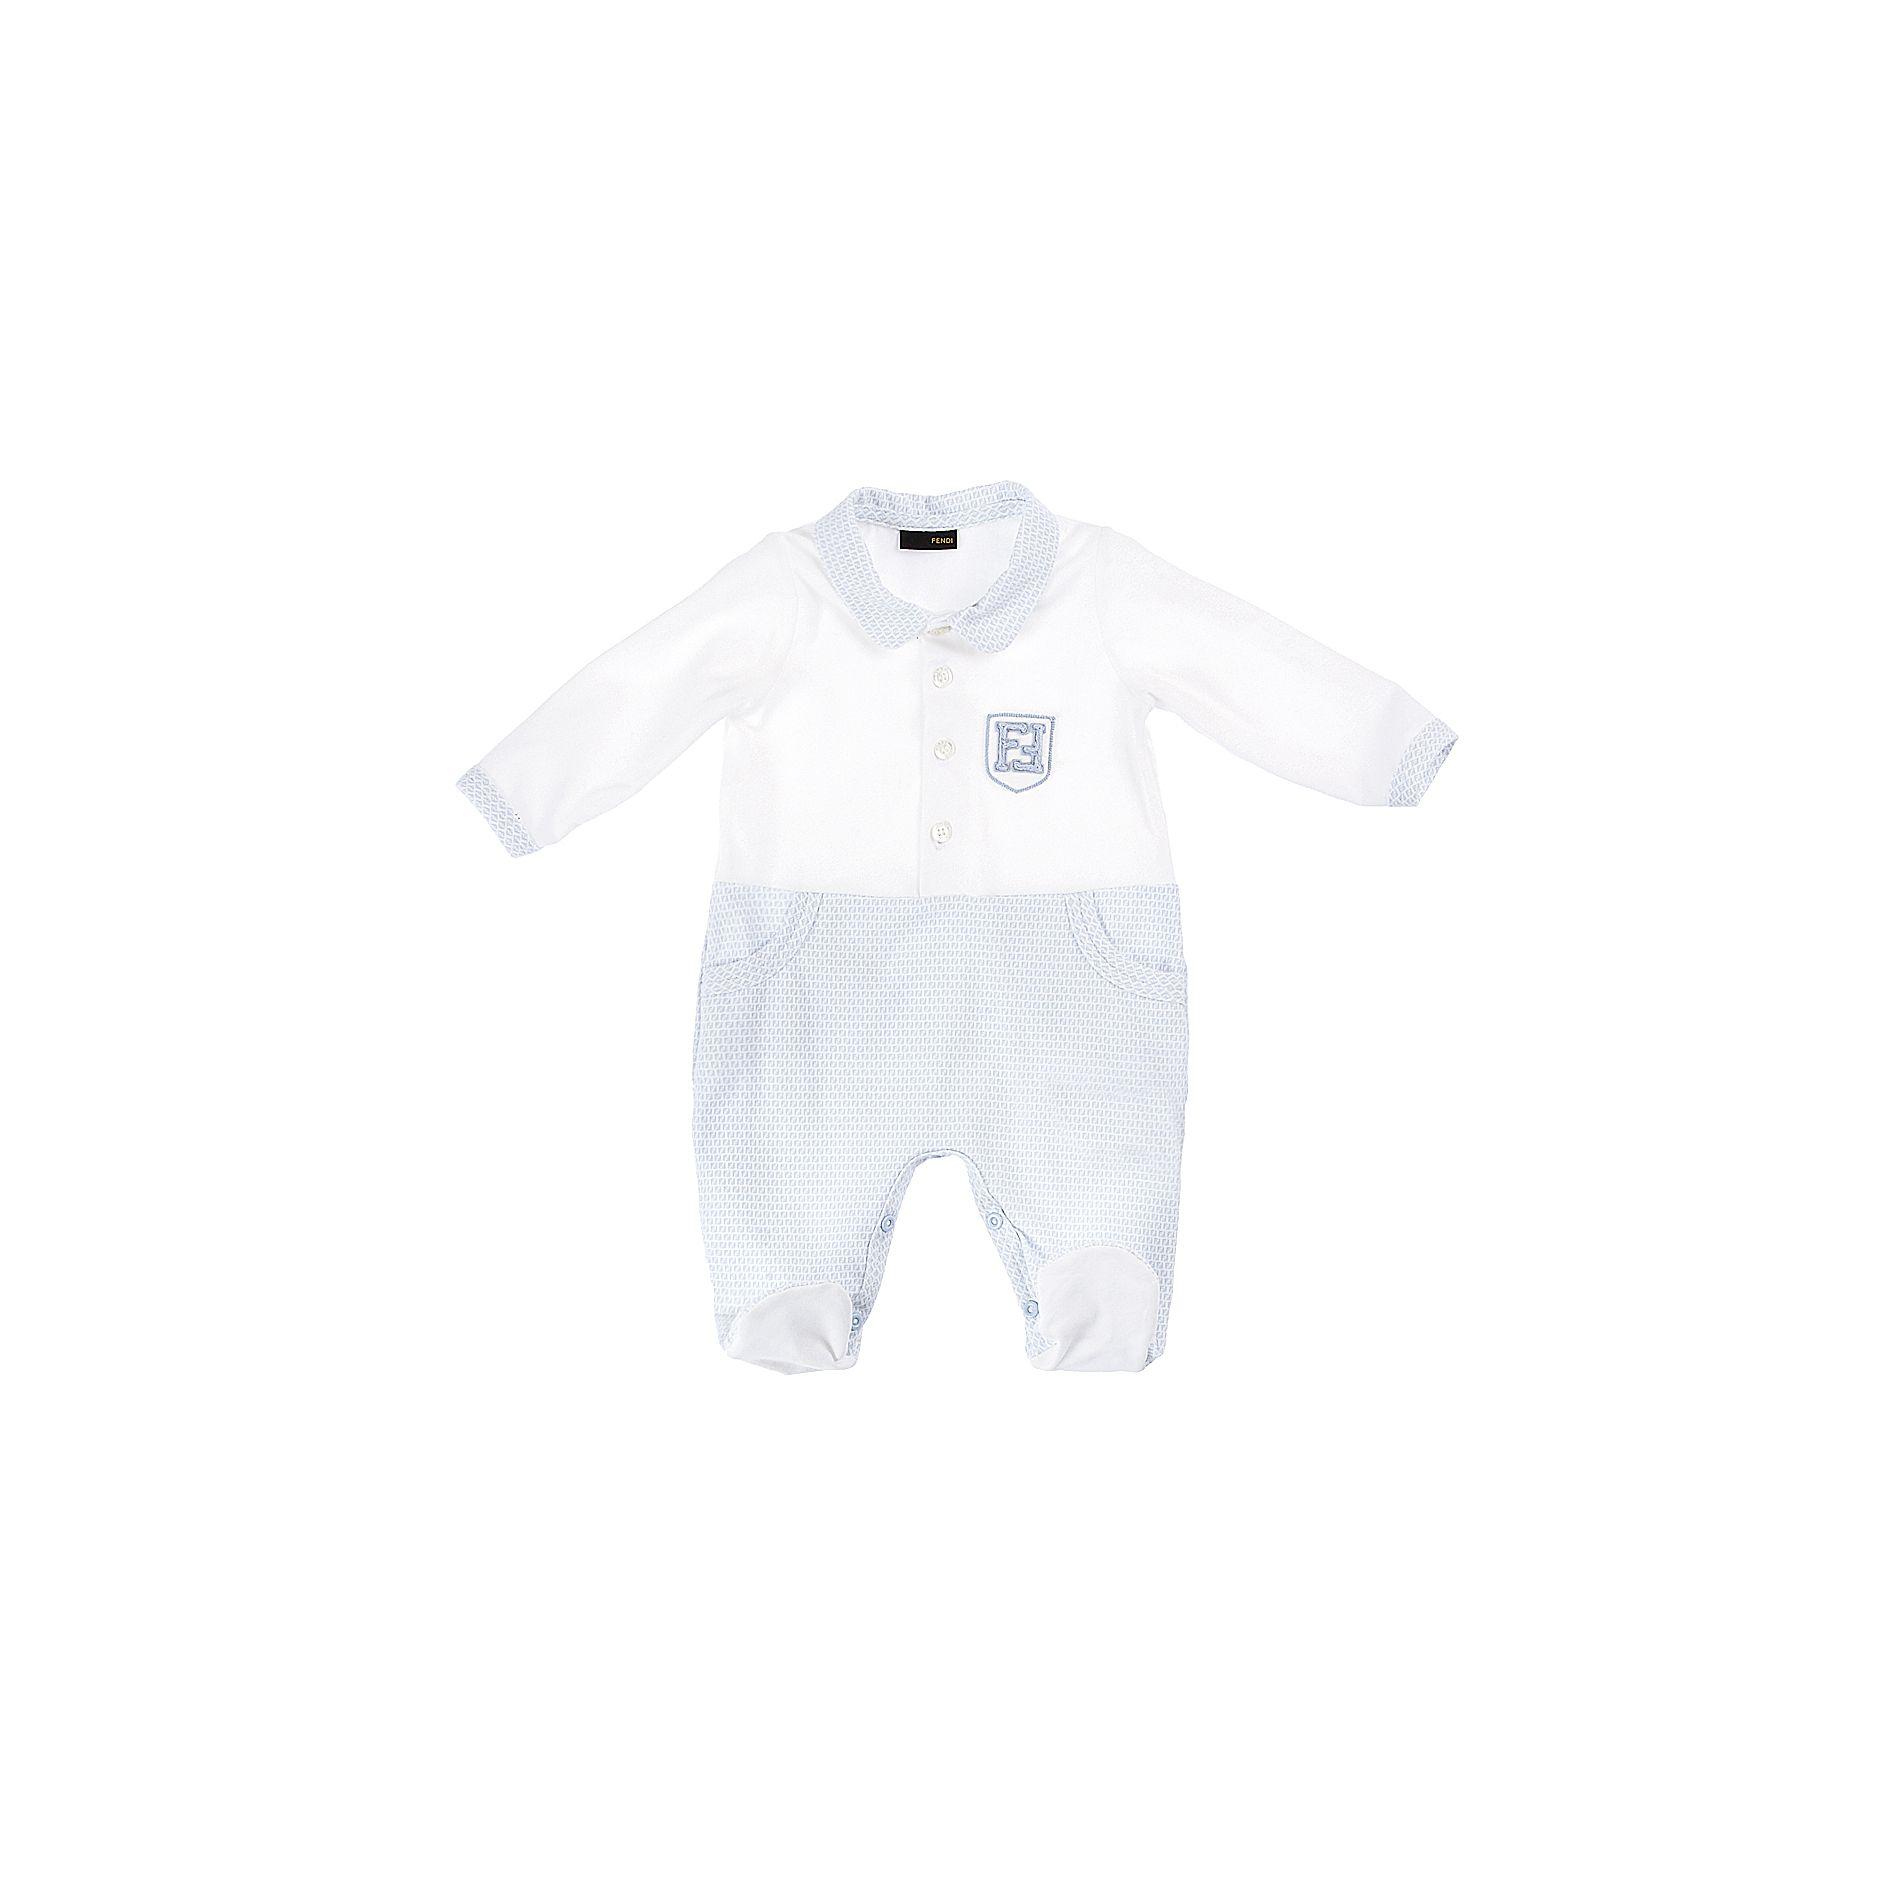 Fendi F/W 2013-14 Baby Kids Collection